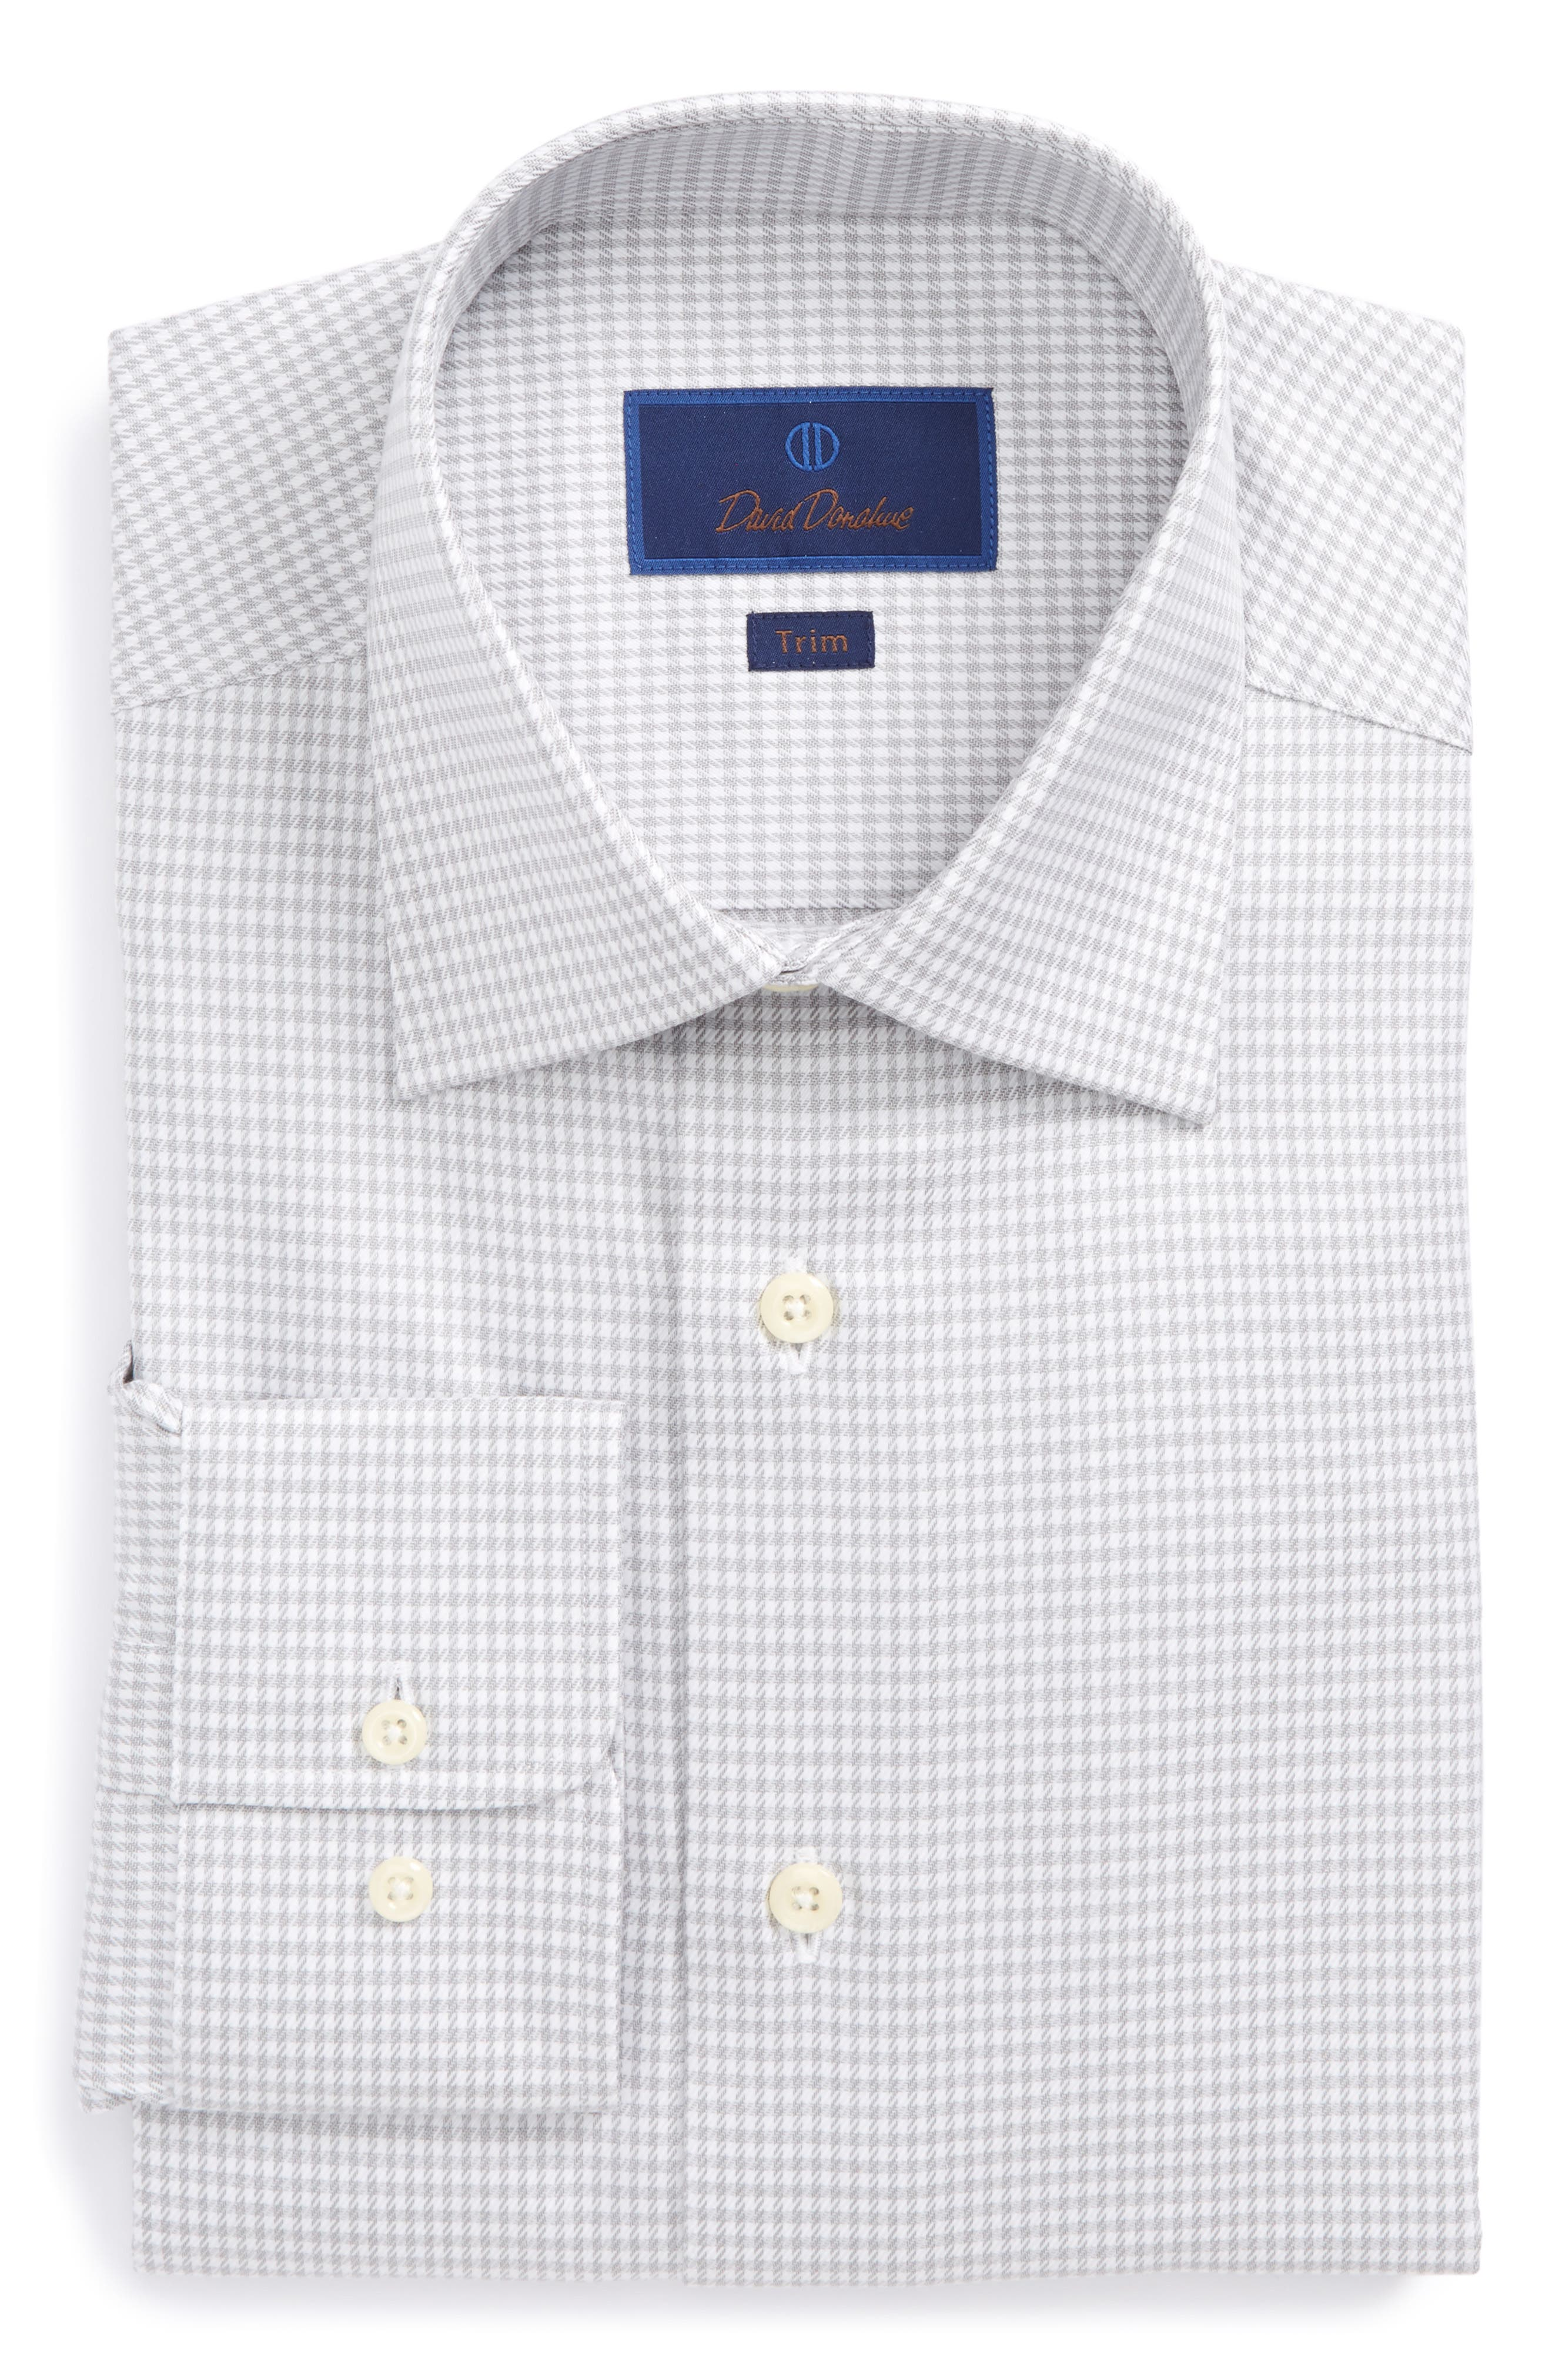 Trim Fit Houndstooth Dress Shirt,                         Main,                         color, Gray